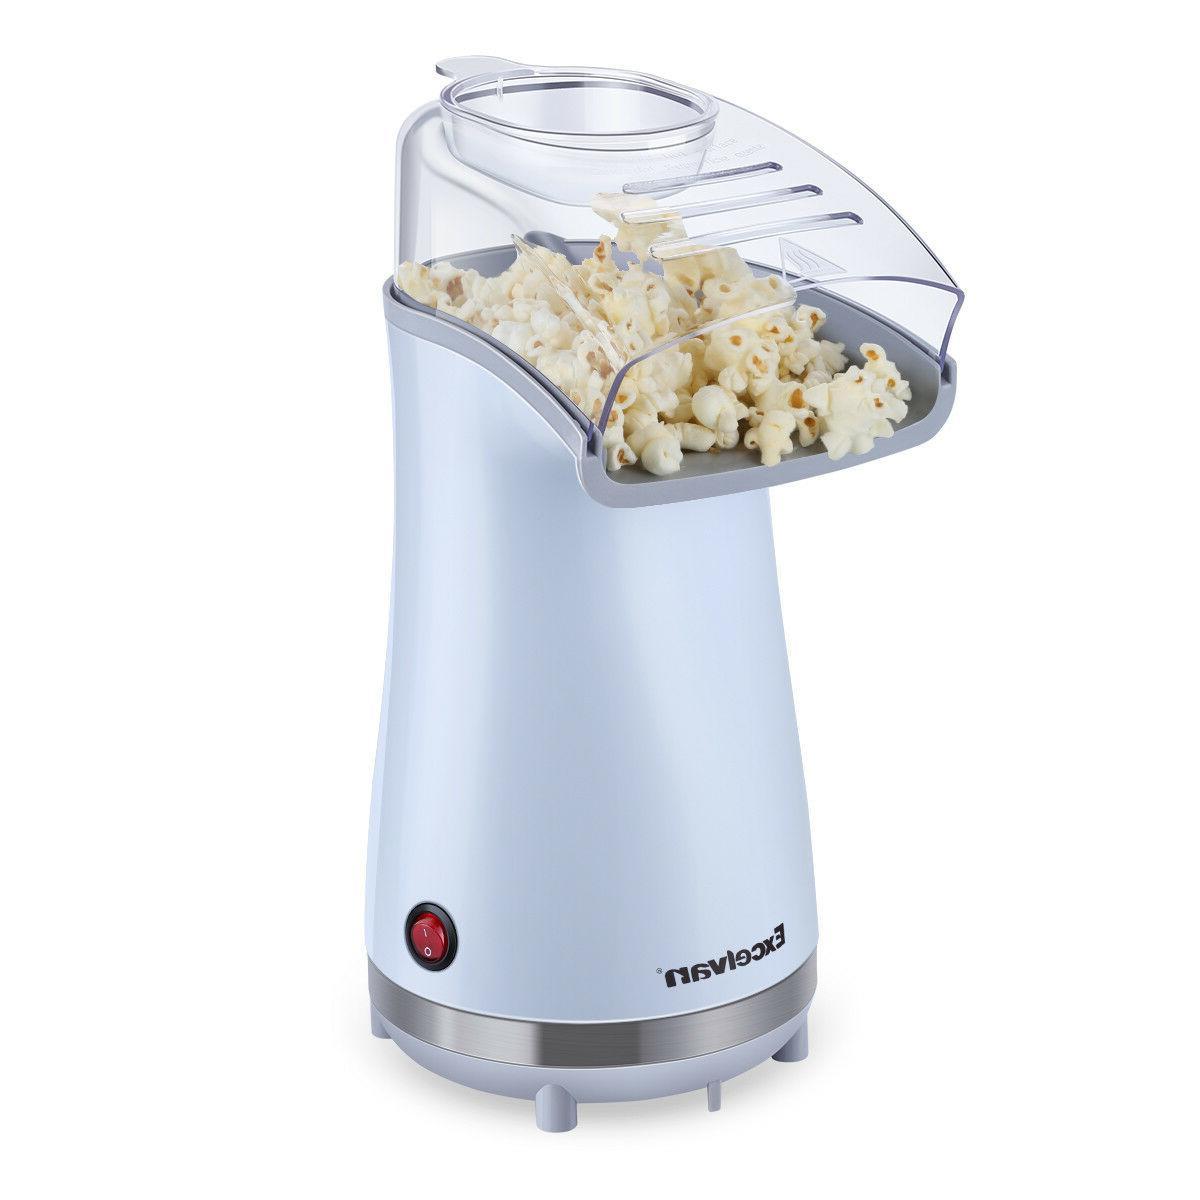 16 Cups Popcorn Popcorn Popper w/ Home Snack